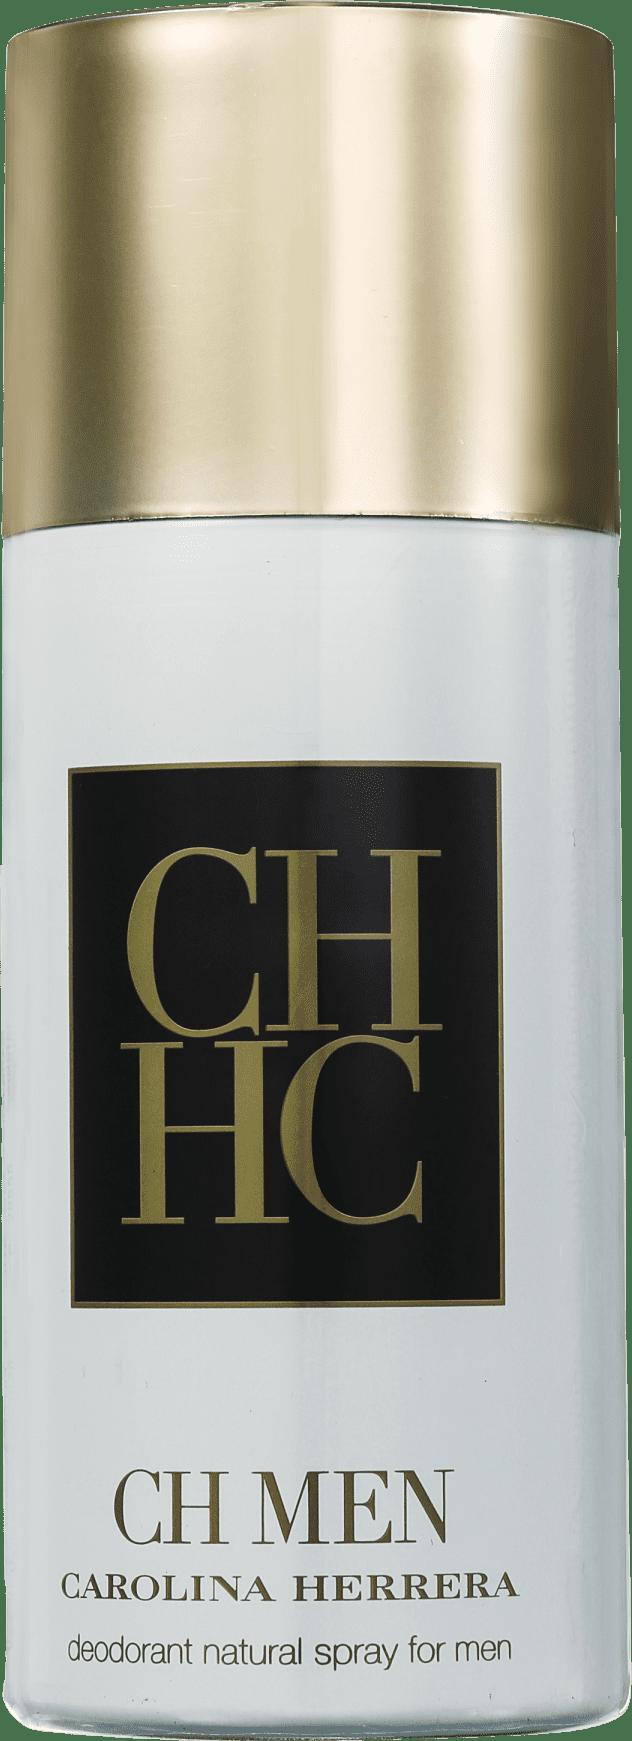 Carolina Herrera CH Men - Desodorante Spray Masculino 150ml d494018b2f